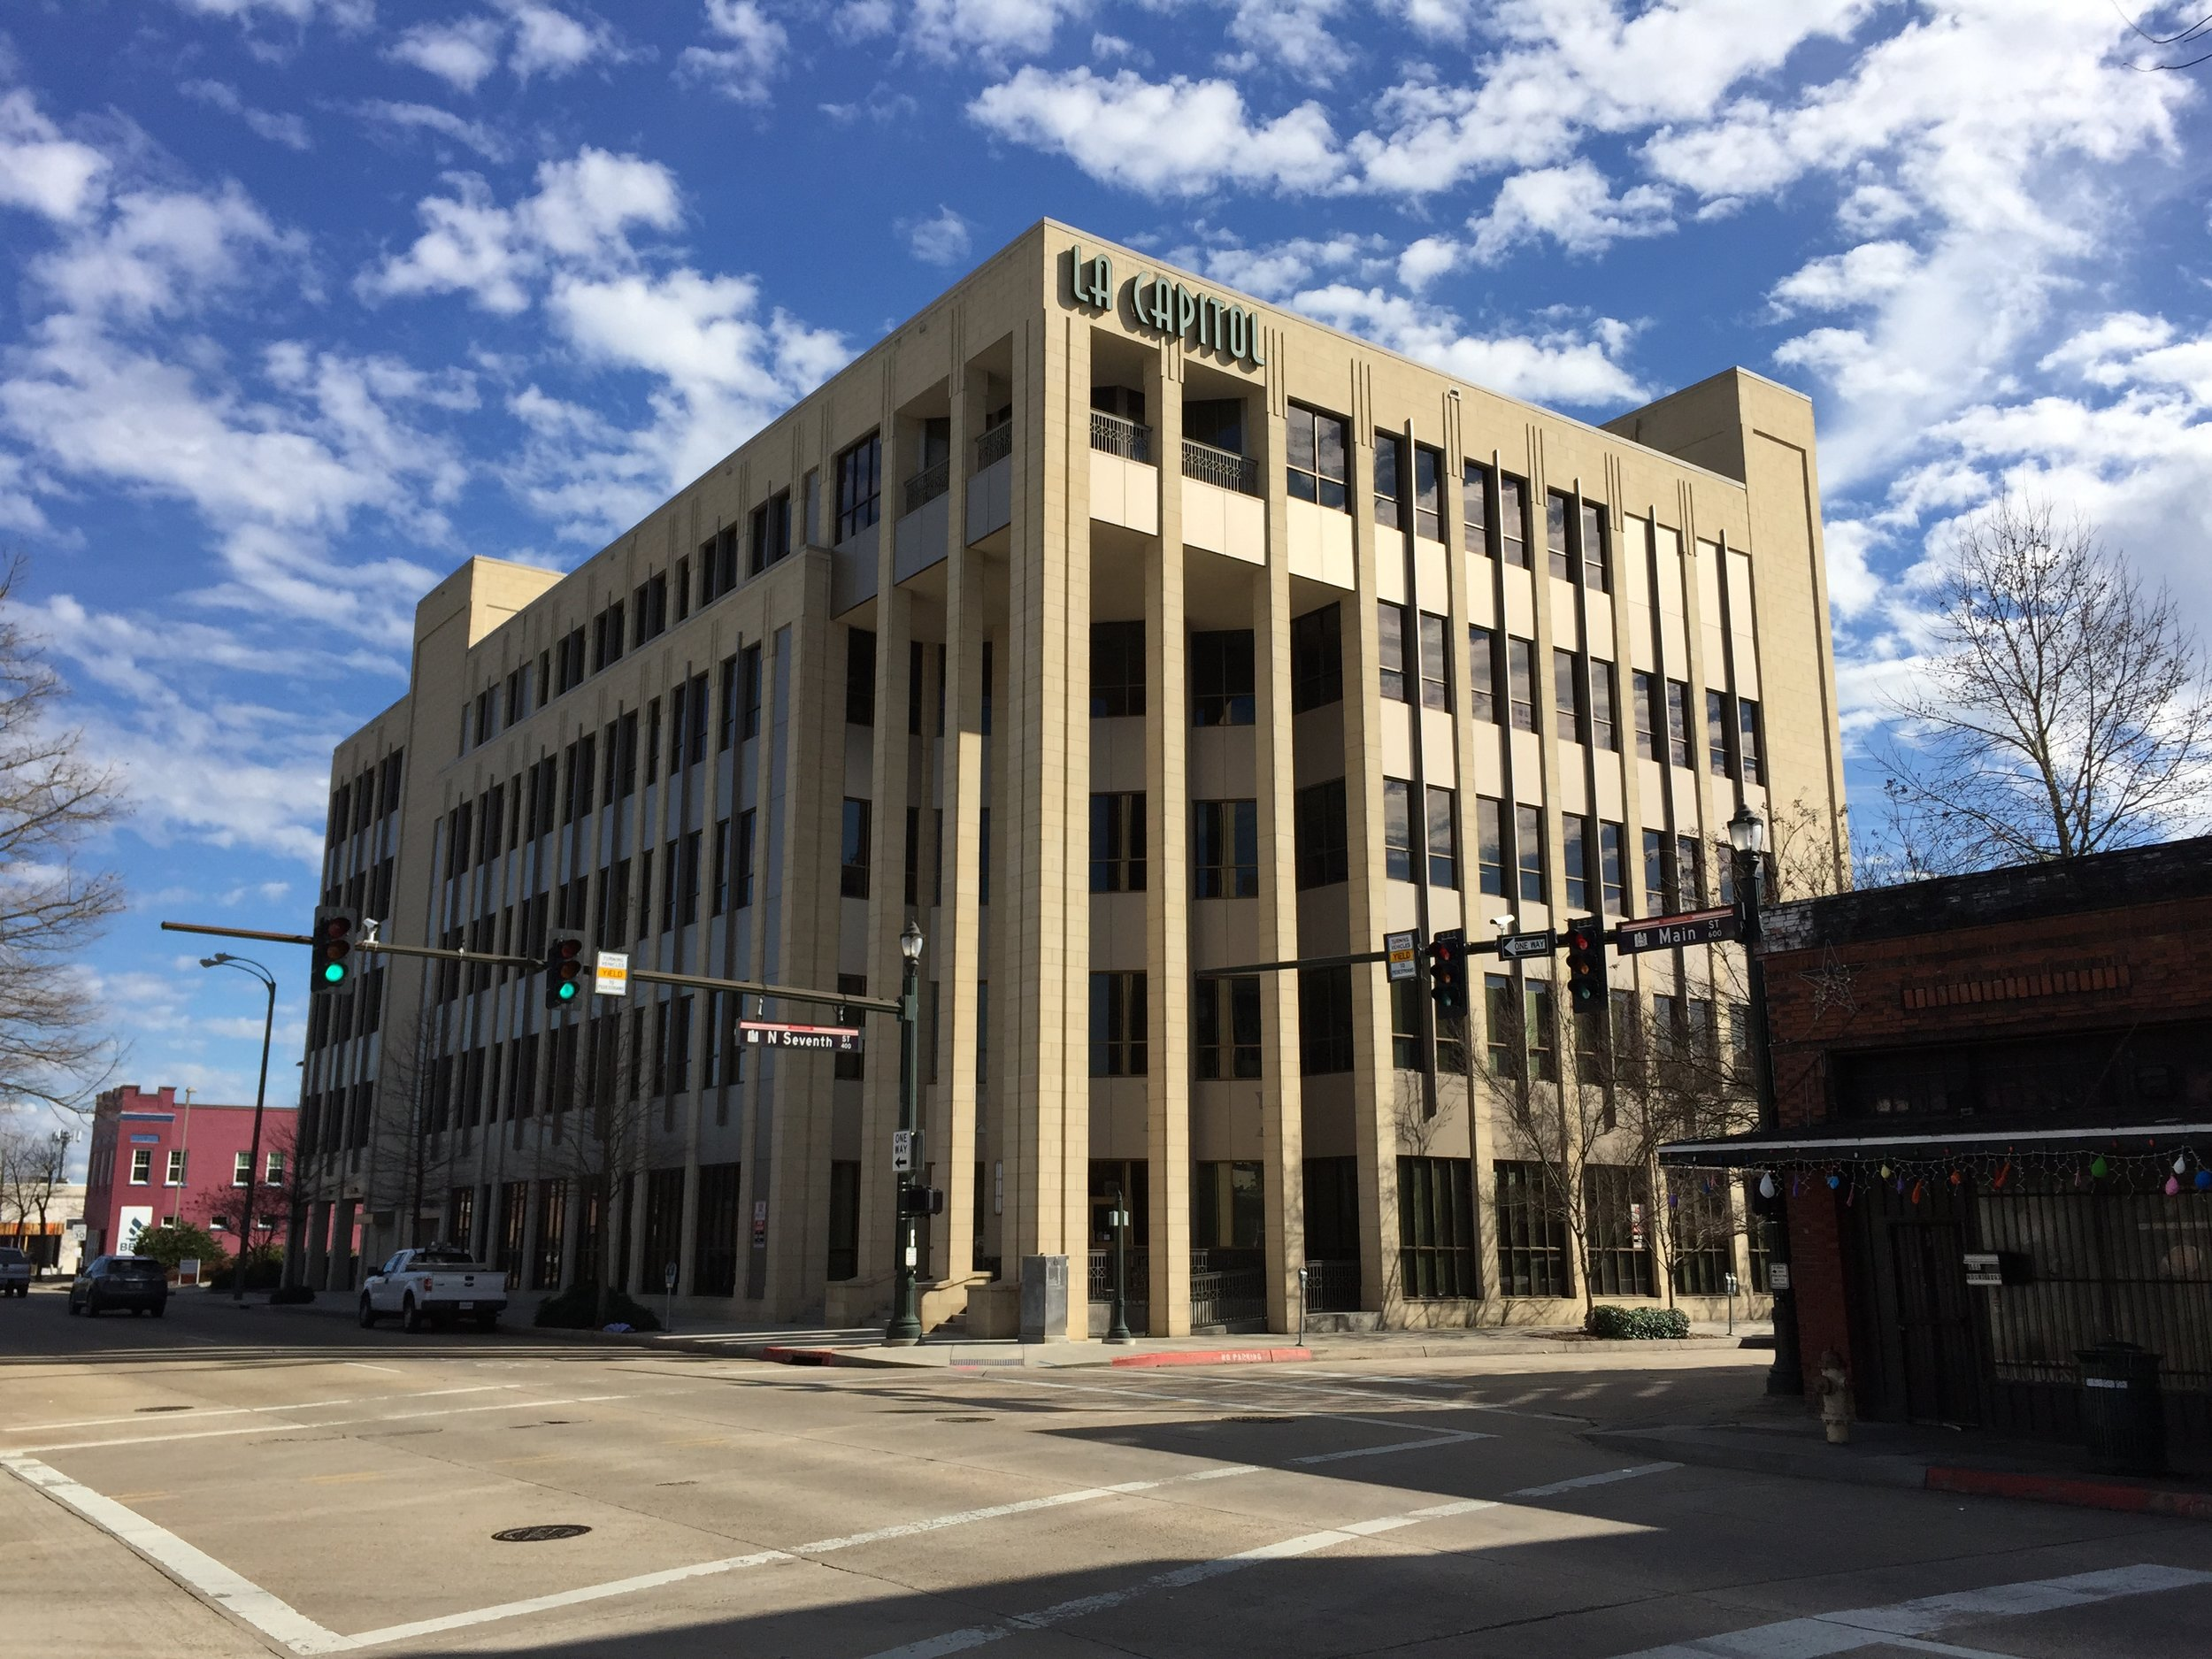 LA Capitol Federal Credit Union